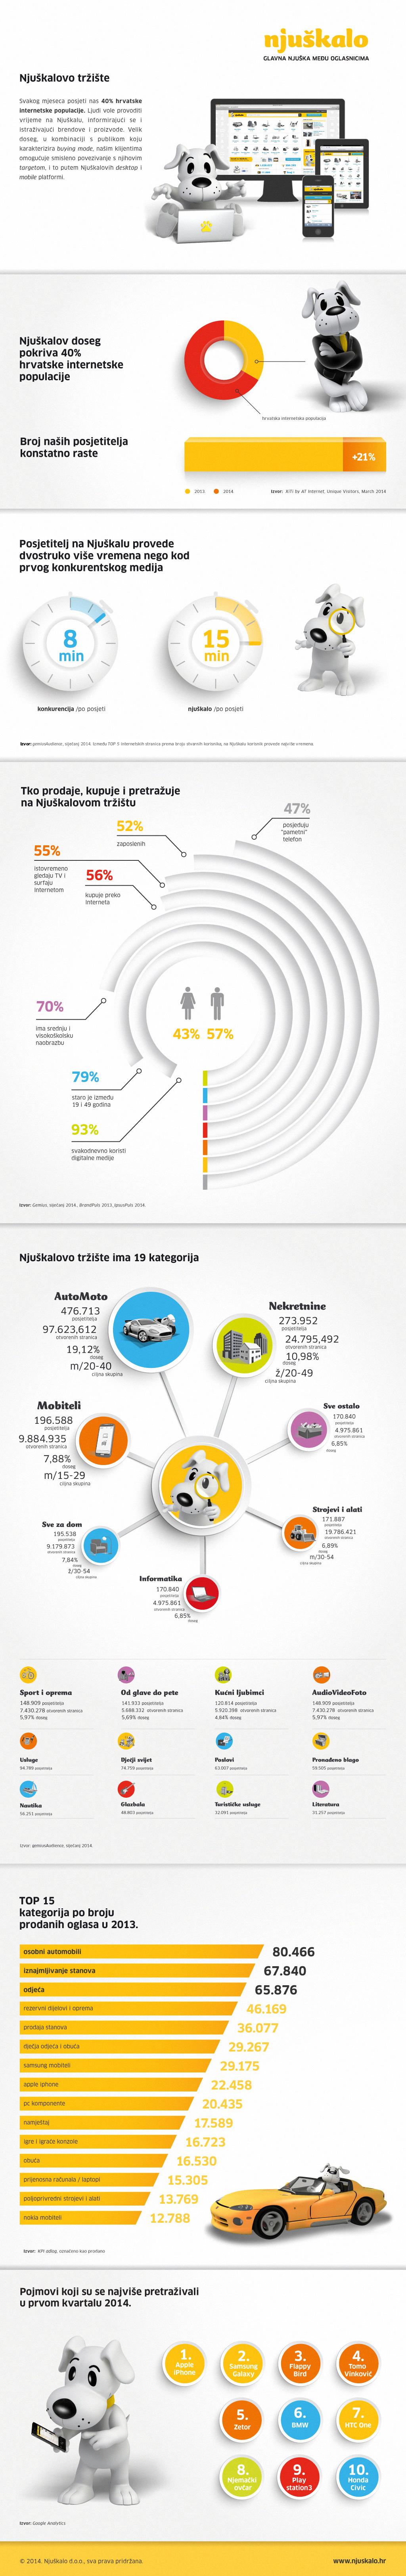 Njuskalo_infografika_2014-WEB_FINAL_OK